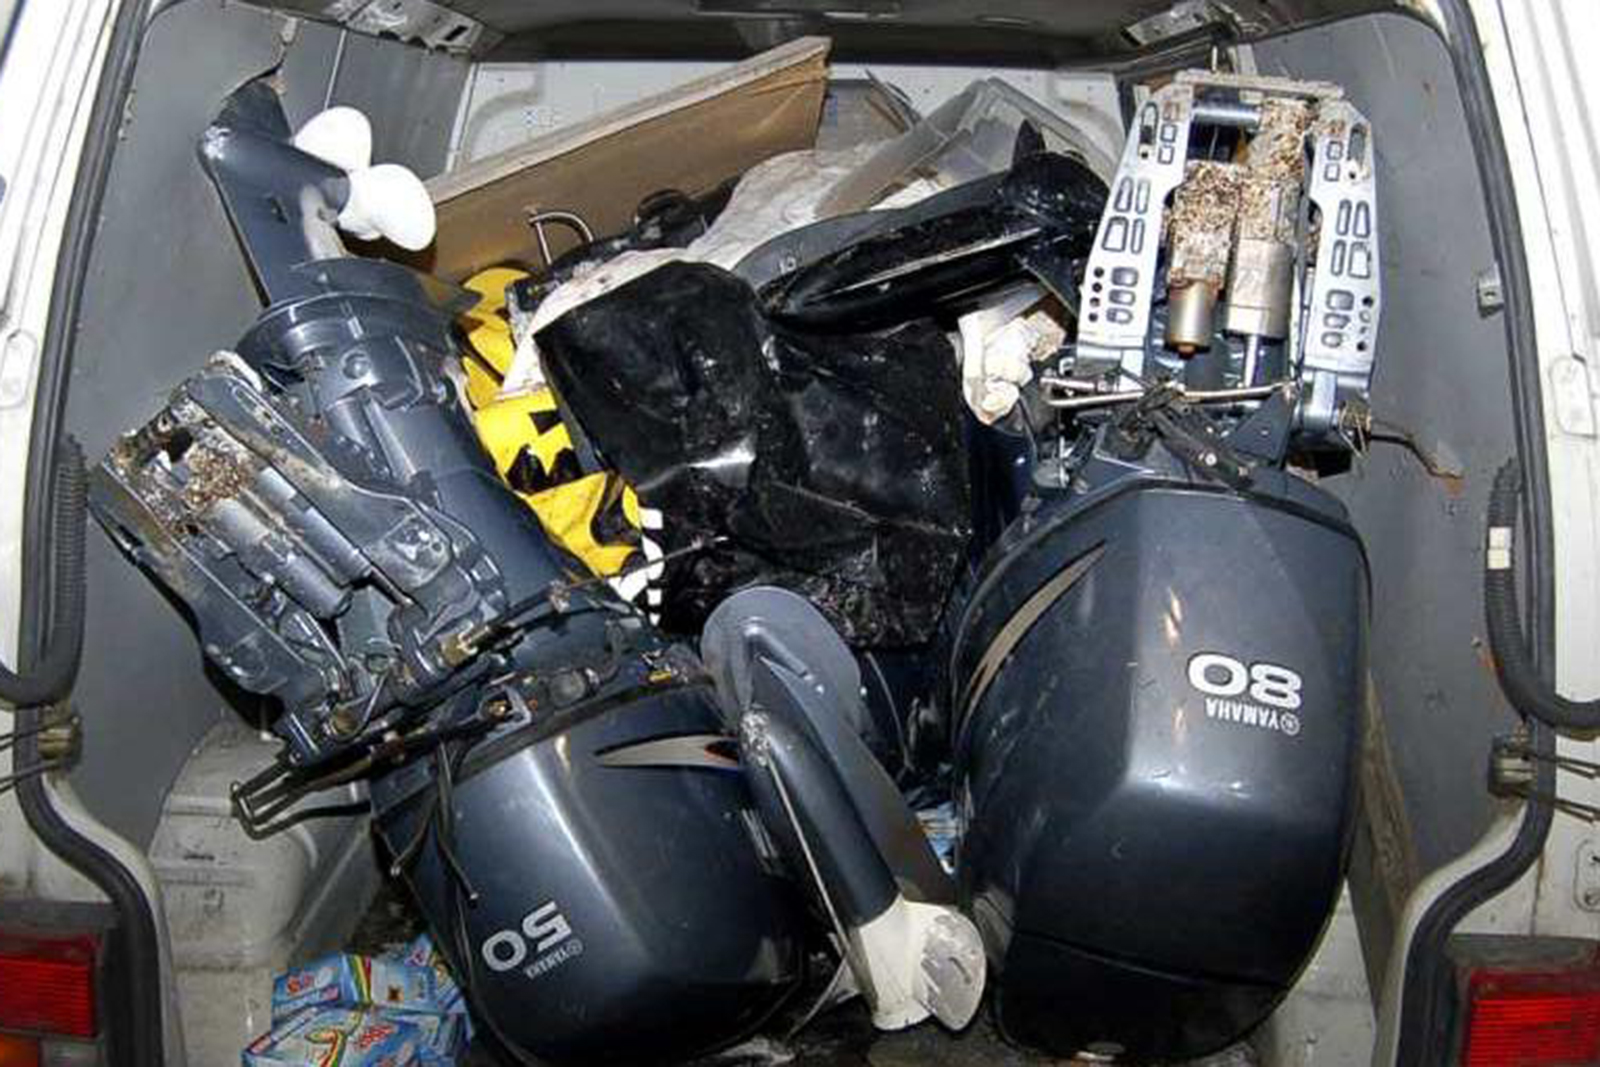 Stulna båtmotorer beslagtogs vid stor insats